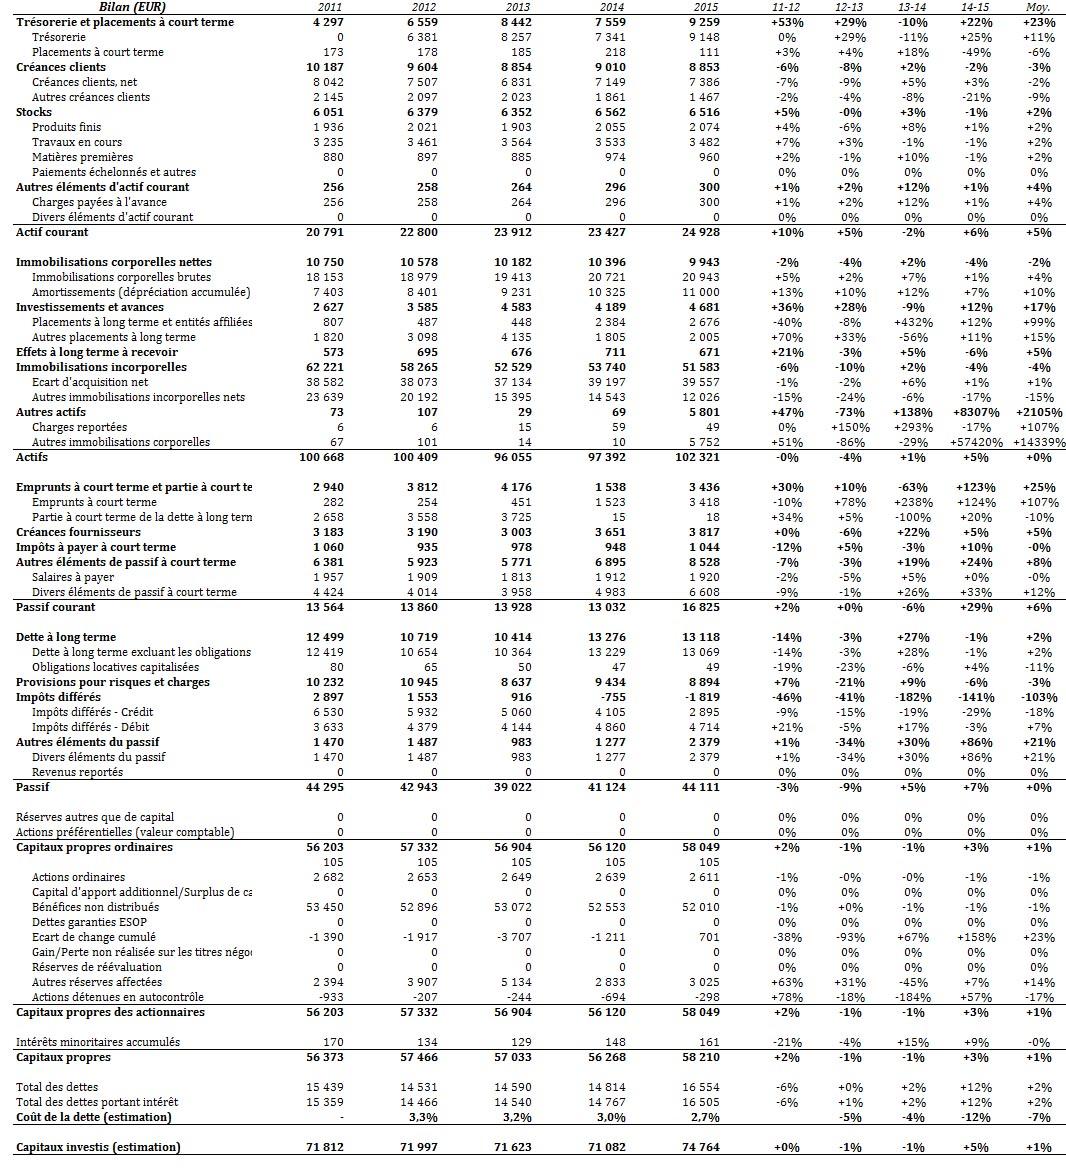 Chiffres financiers de Sanofi : bilan